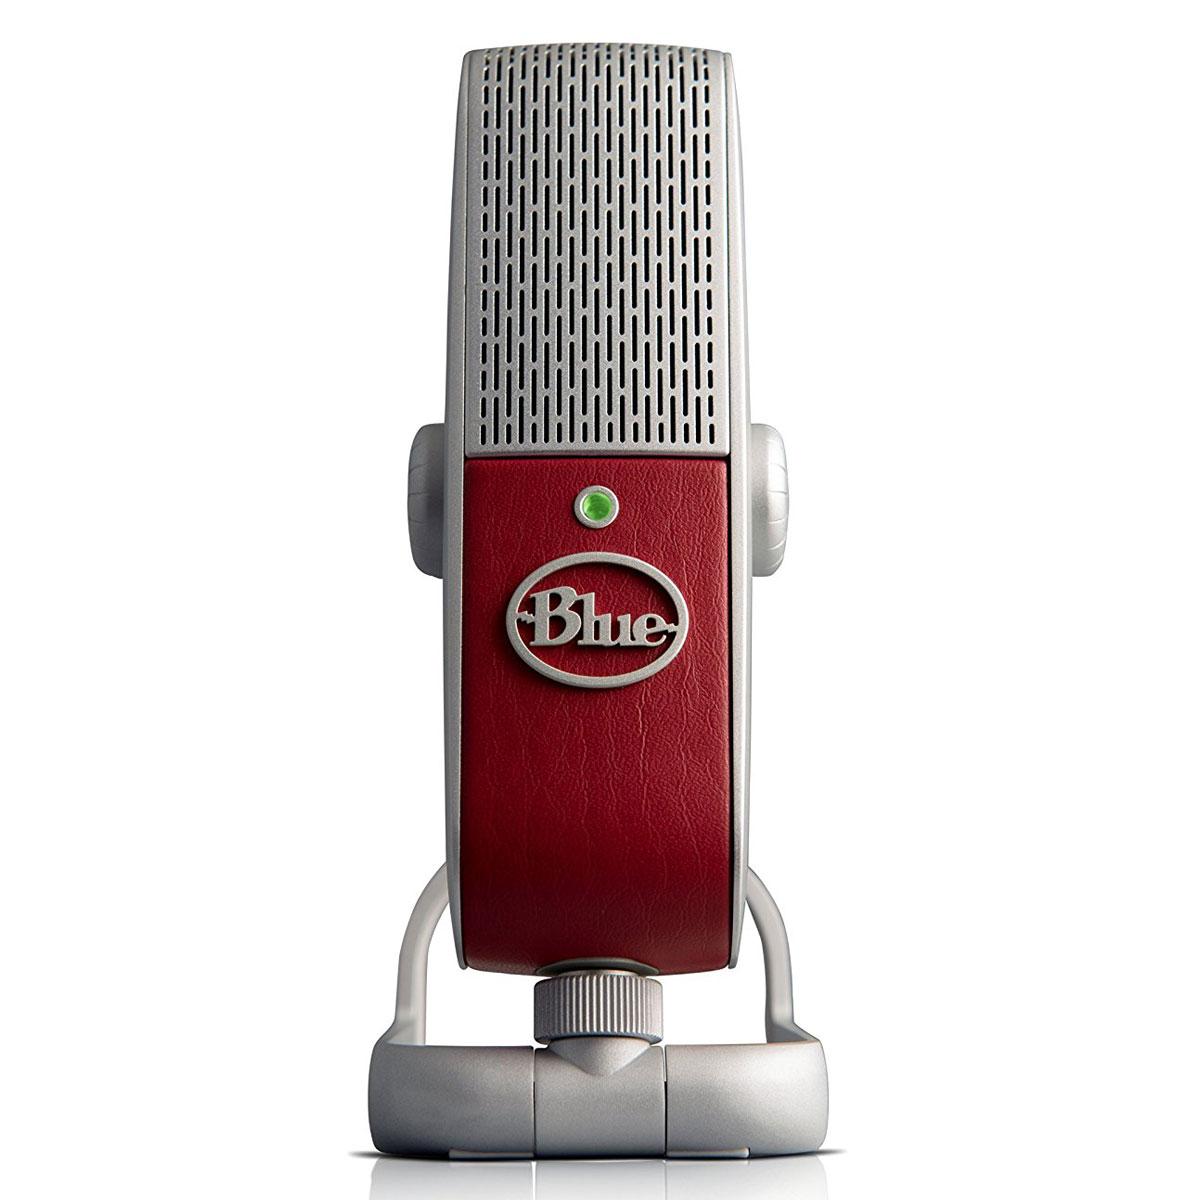 Blue Microphones Raspberry : blue microphones raspberry 0311 achat vente microphone sur ~ Vivirlamusica.com Haus und Dekorationen